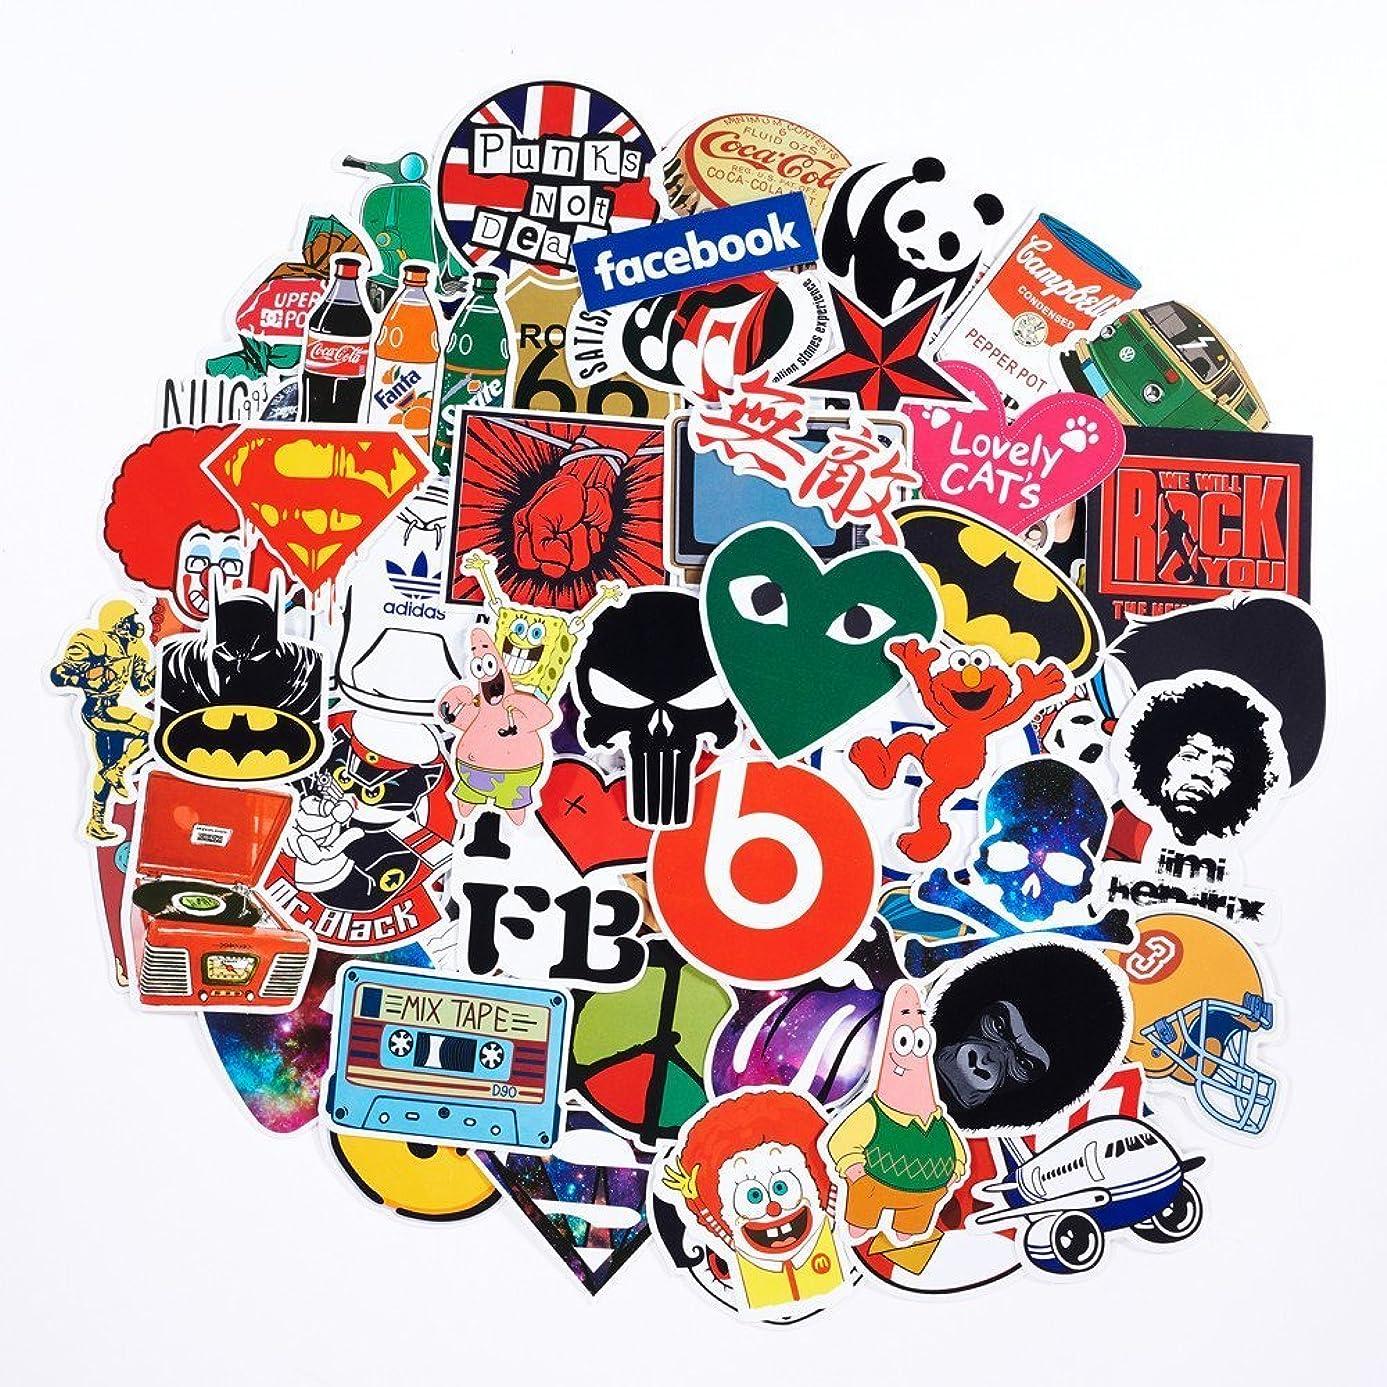 100-Pack SuprCool Waterproof Vinyl Stickers For Laptop, Macbook, Skateboard, Luggage, Car, Bicycle - Funny Random Sticker Set